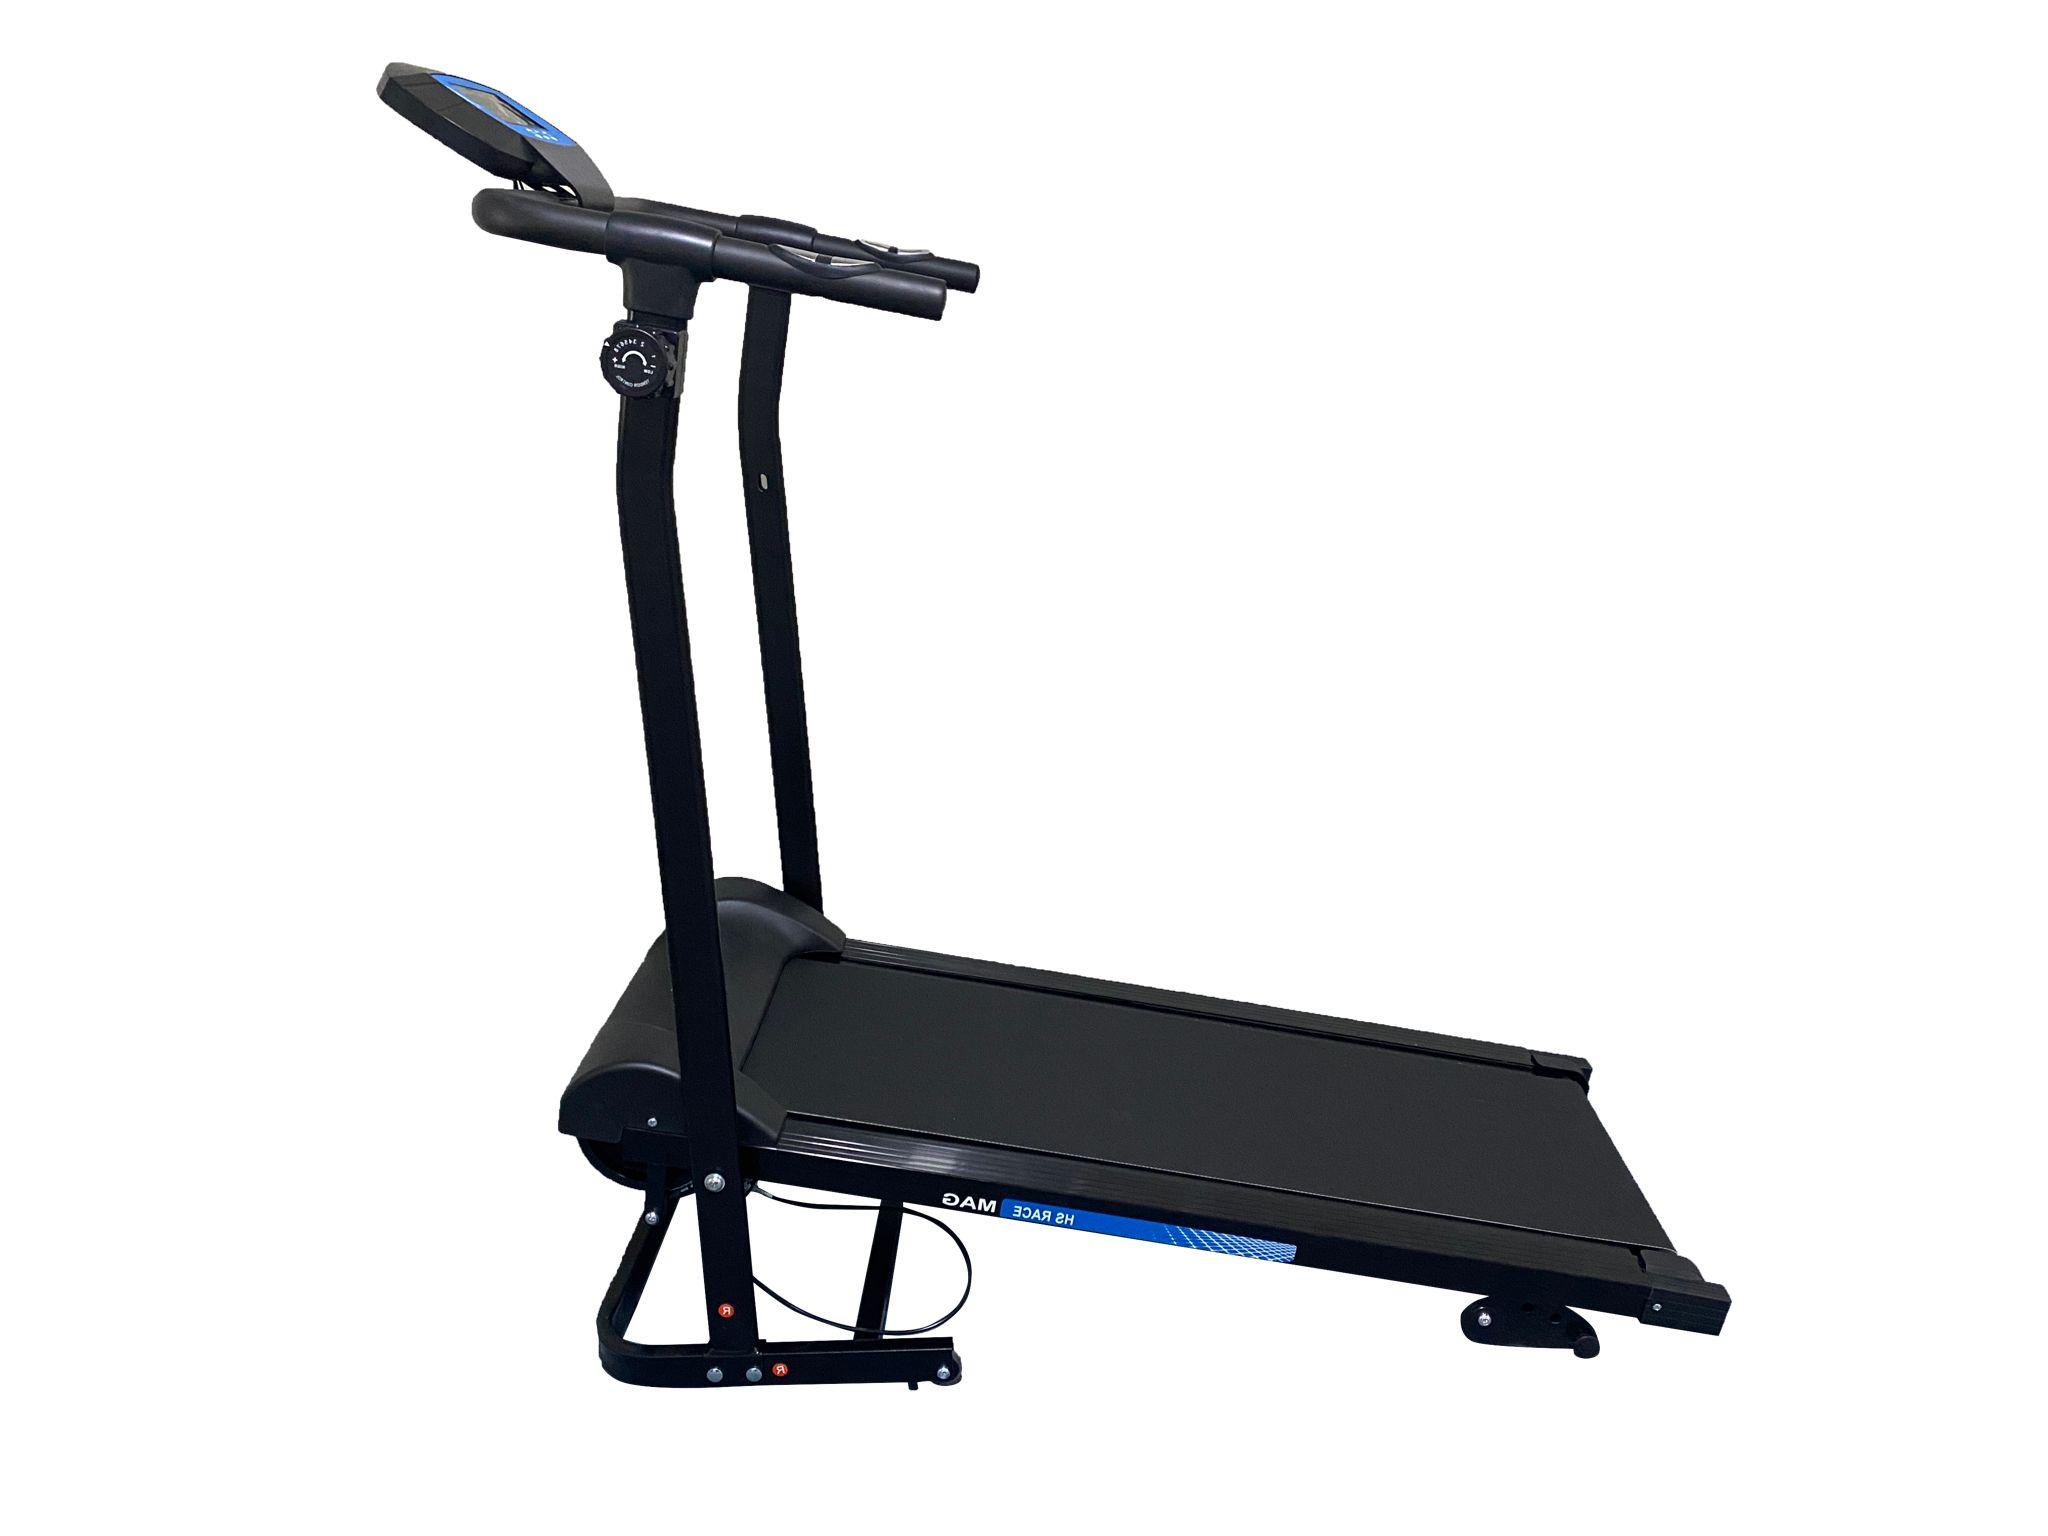 FD Sport Tapis roulant Magnetico FD Race Mag Inclinazione Manuale 3 livelli Portata 110 kg